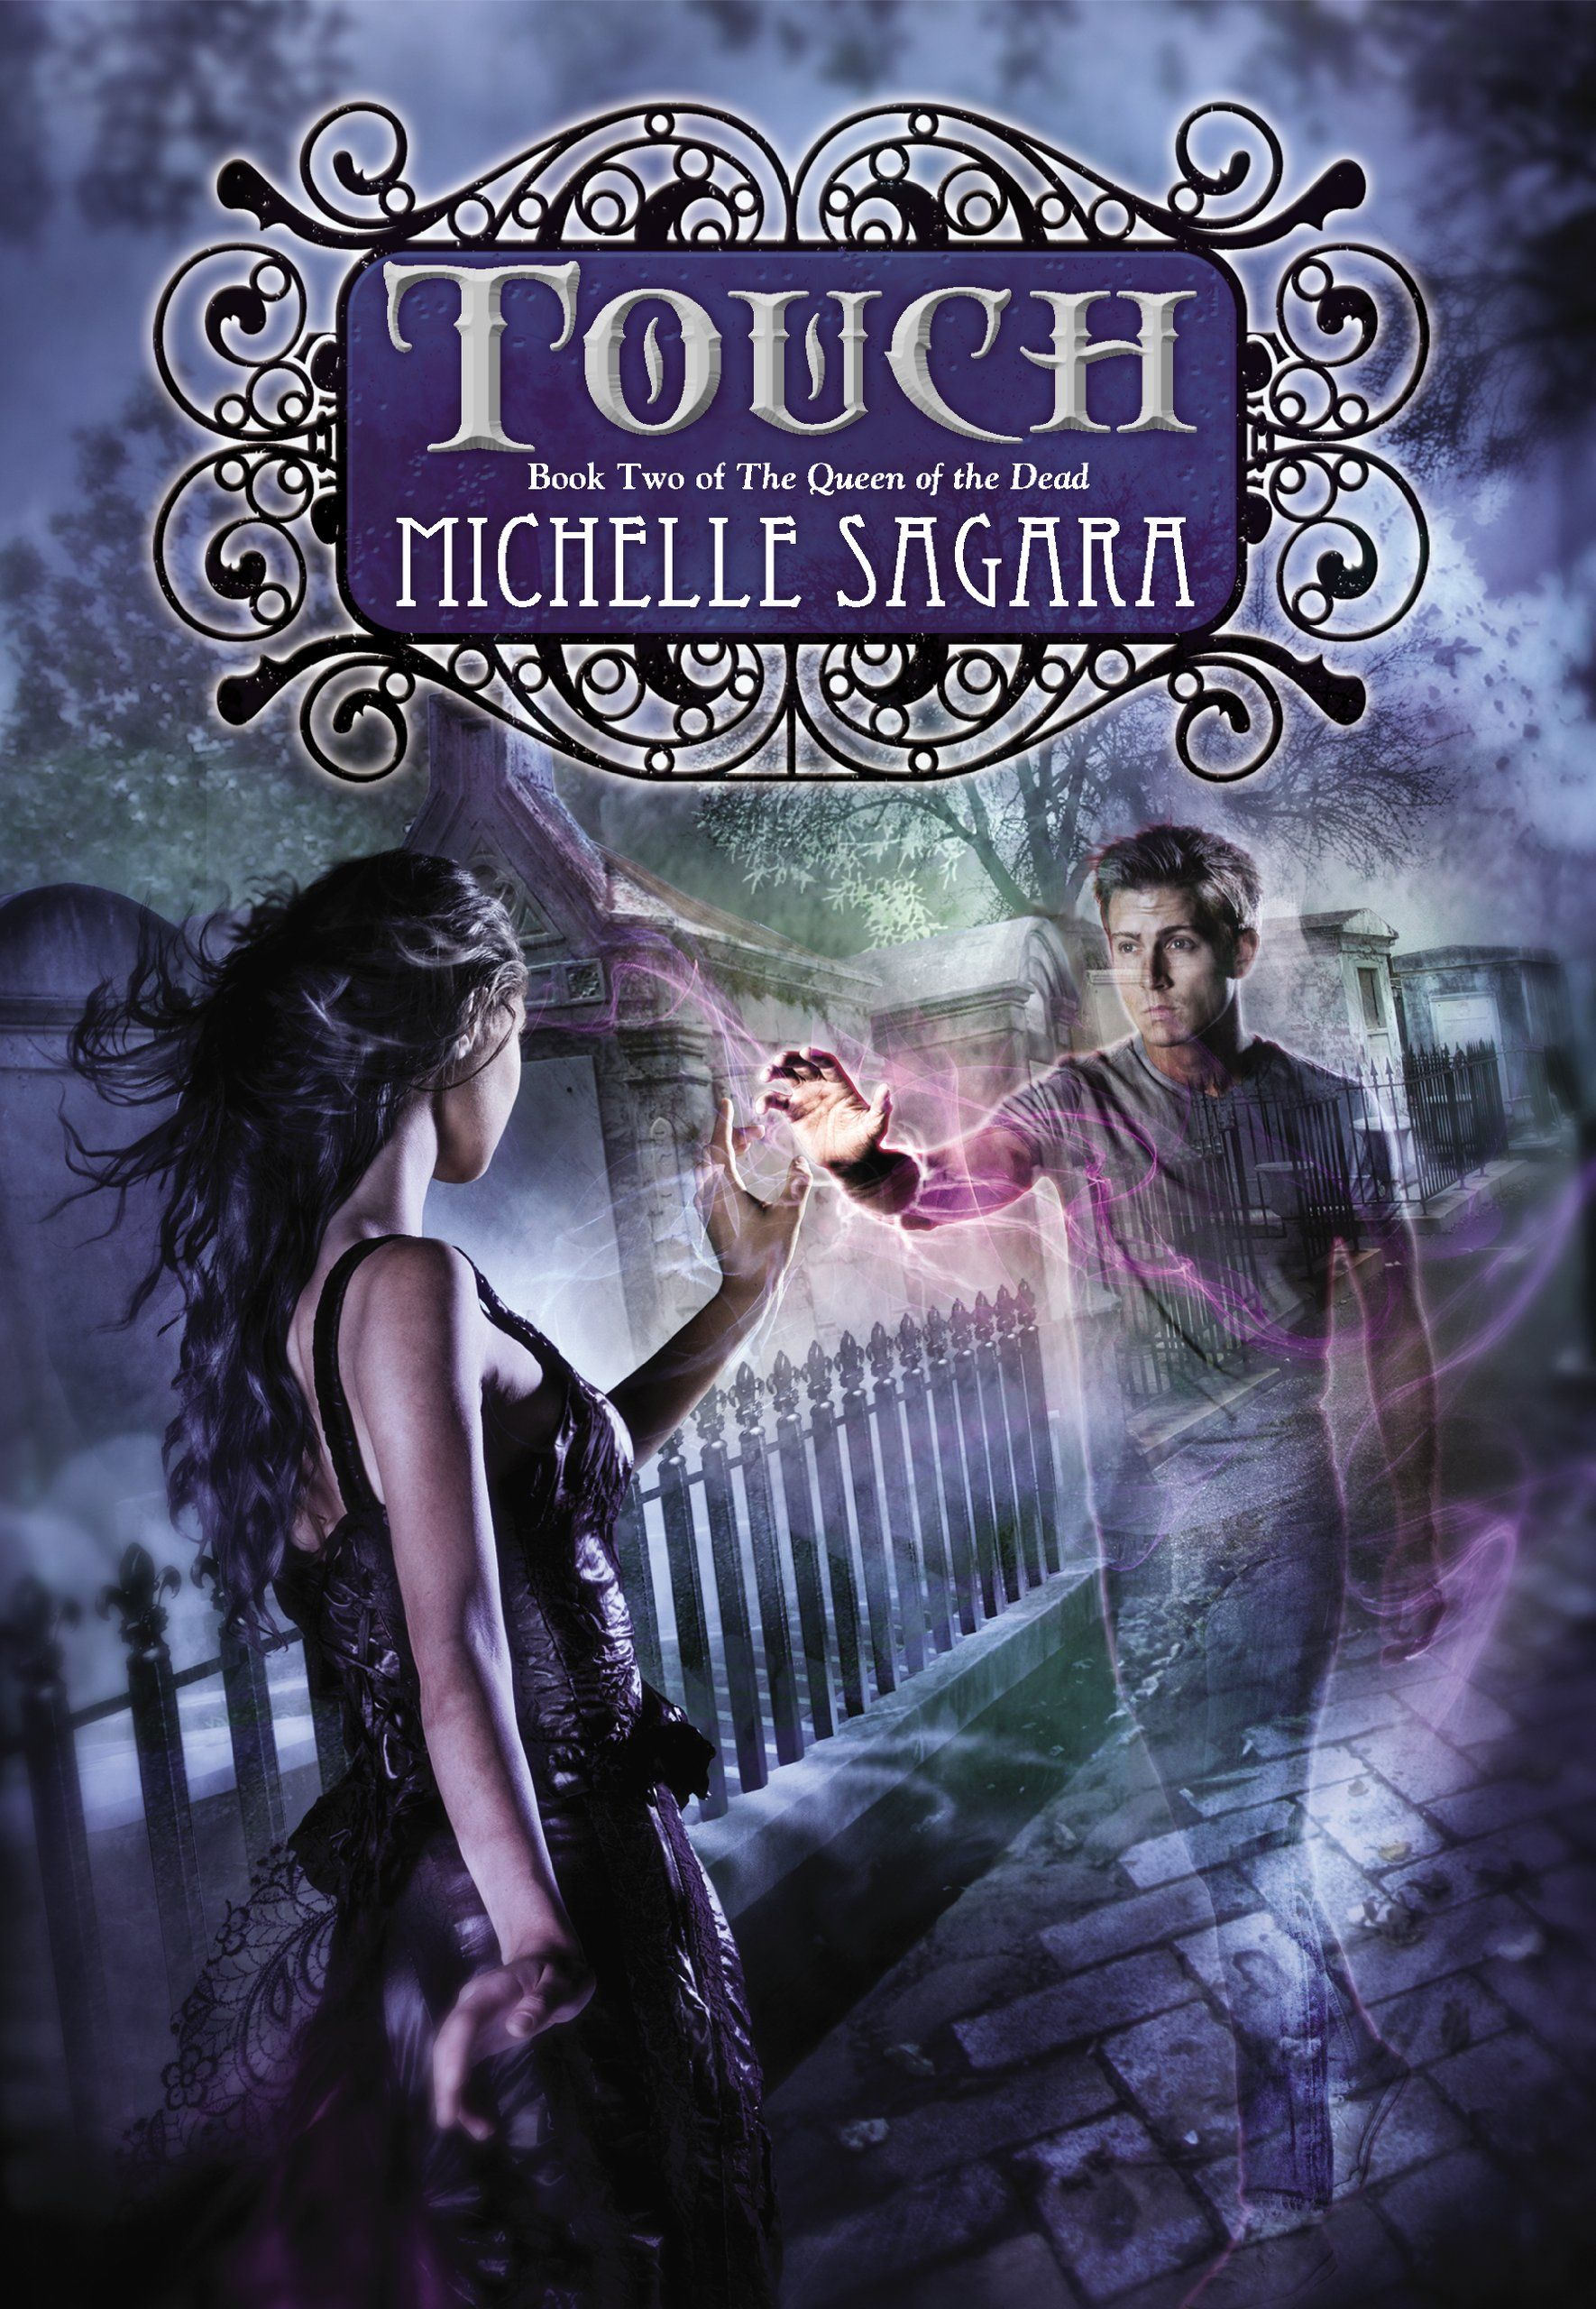 Michelle Sagara Touch Awordfromjojo Paranormal Fantasy Youngadult Urbanfantasy Michellesagara Romance Covers Art Wattpad Book Covers Book Cover Art